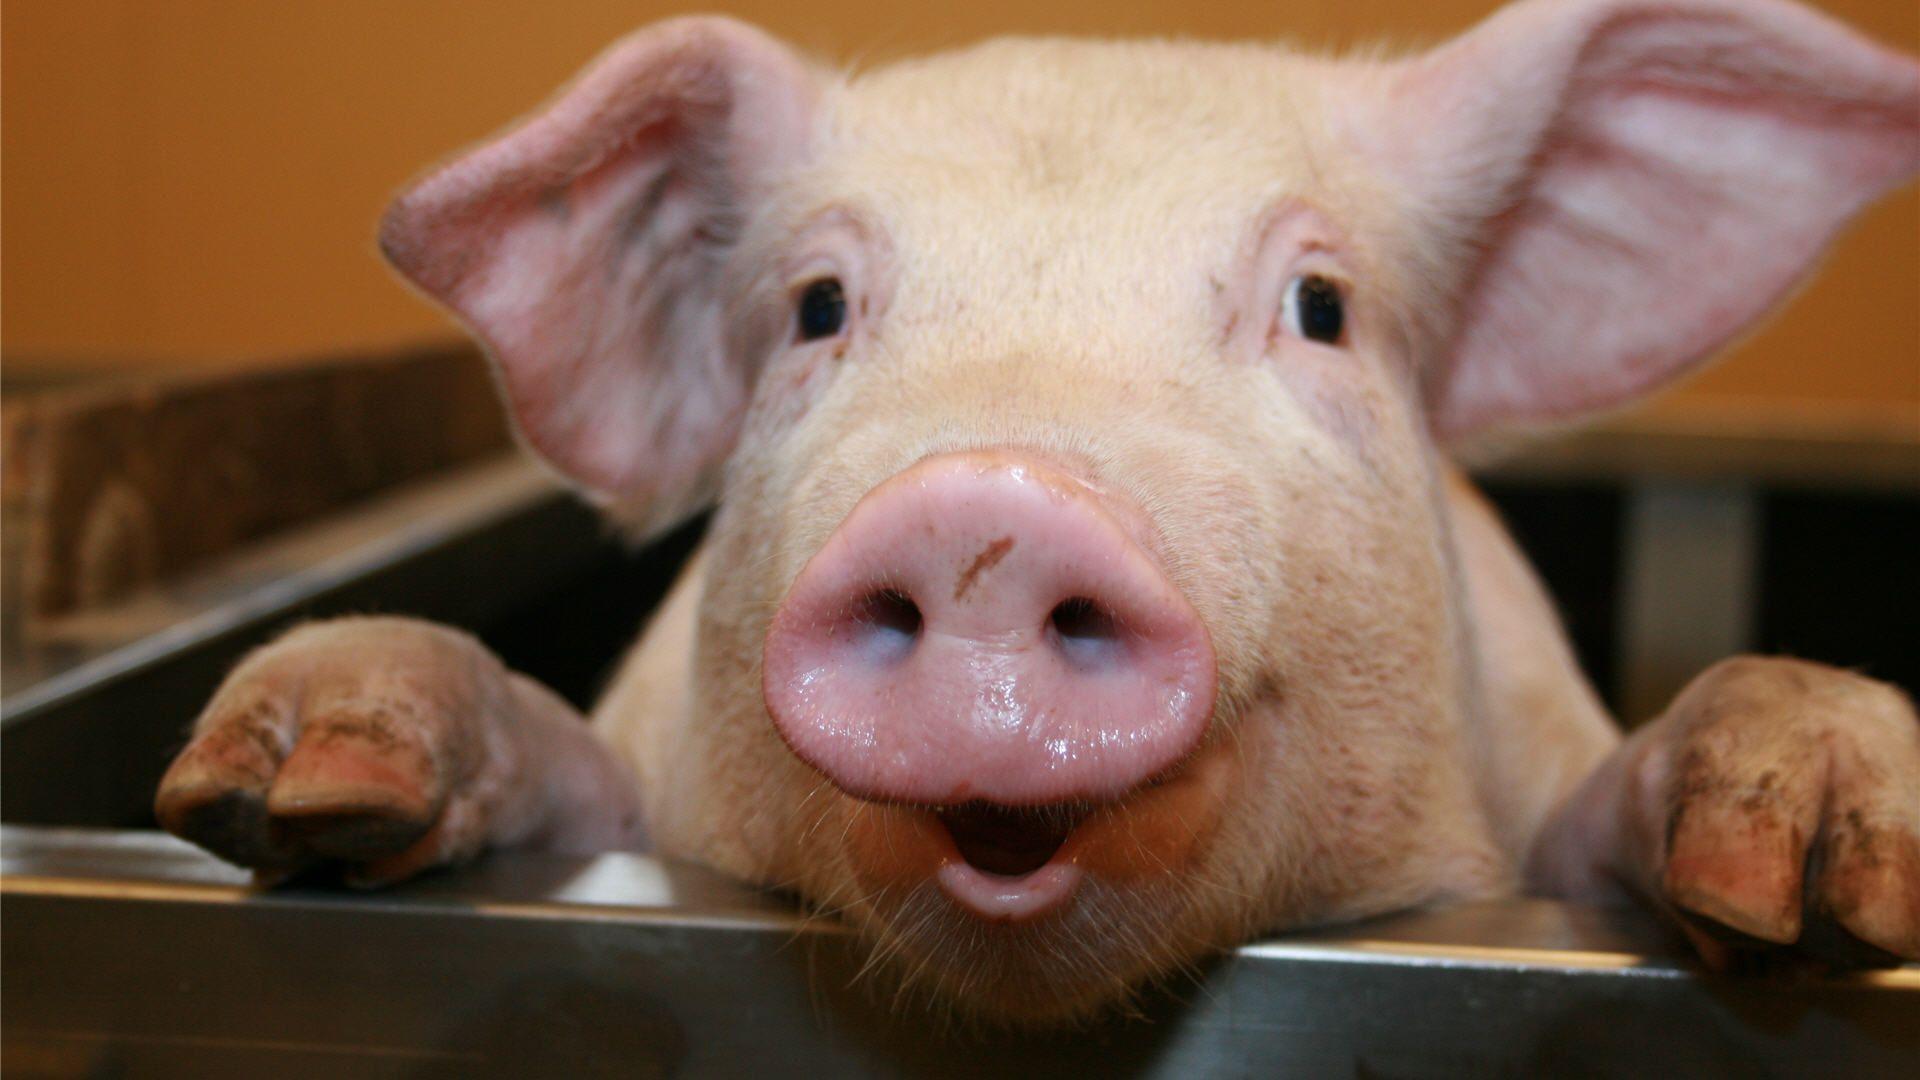 Pig HD Wallpapers - HD Wallpapers Inn